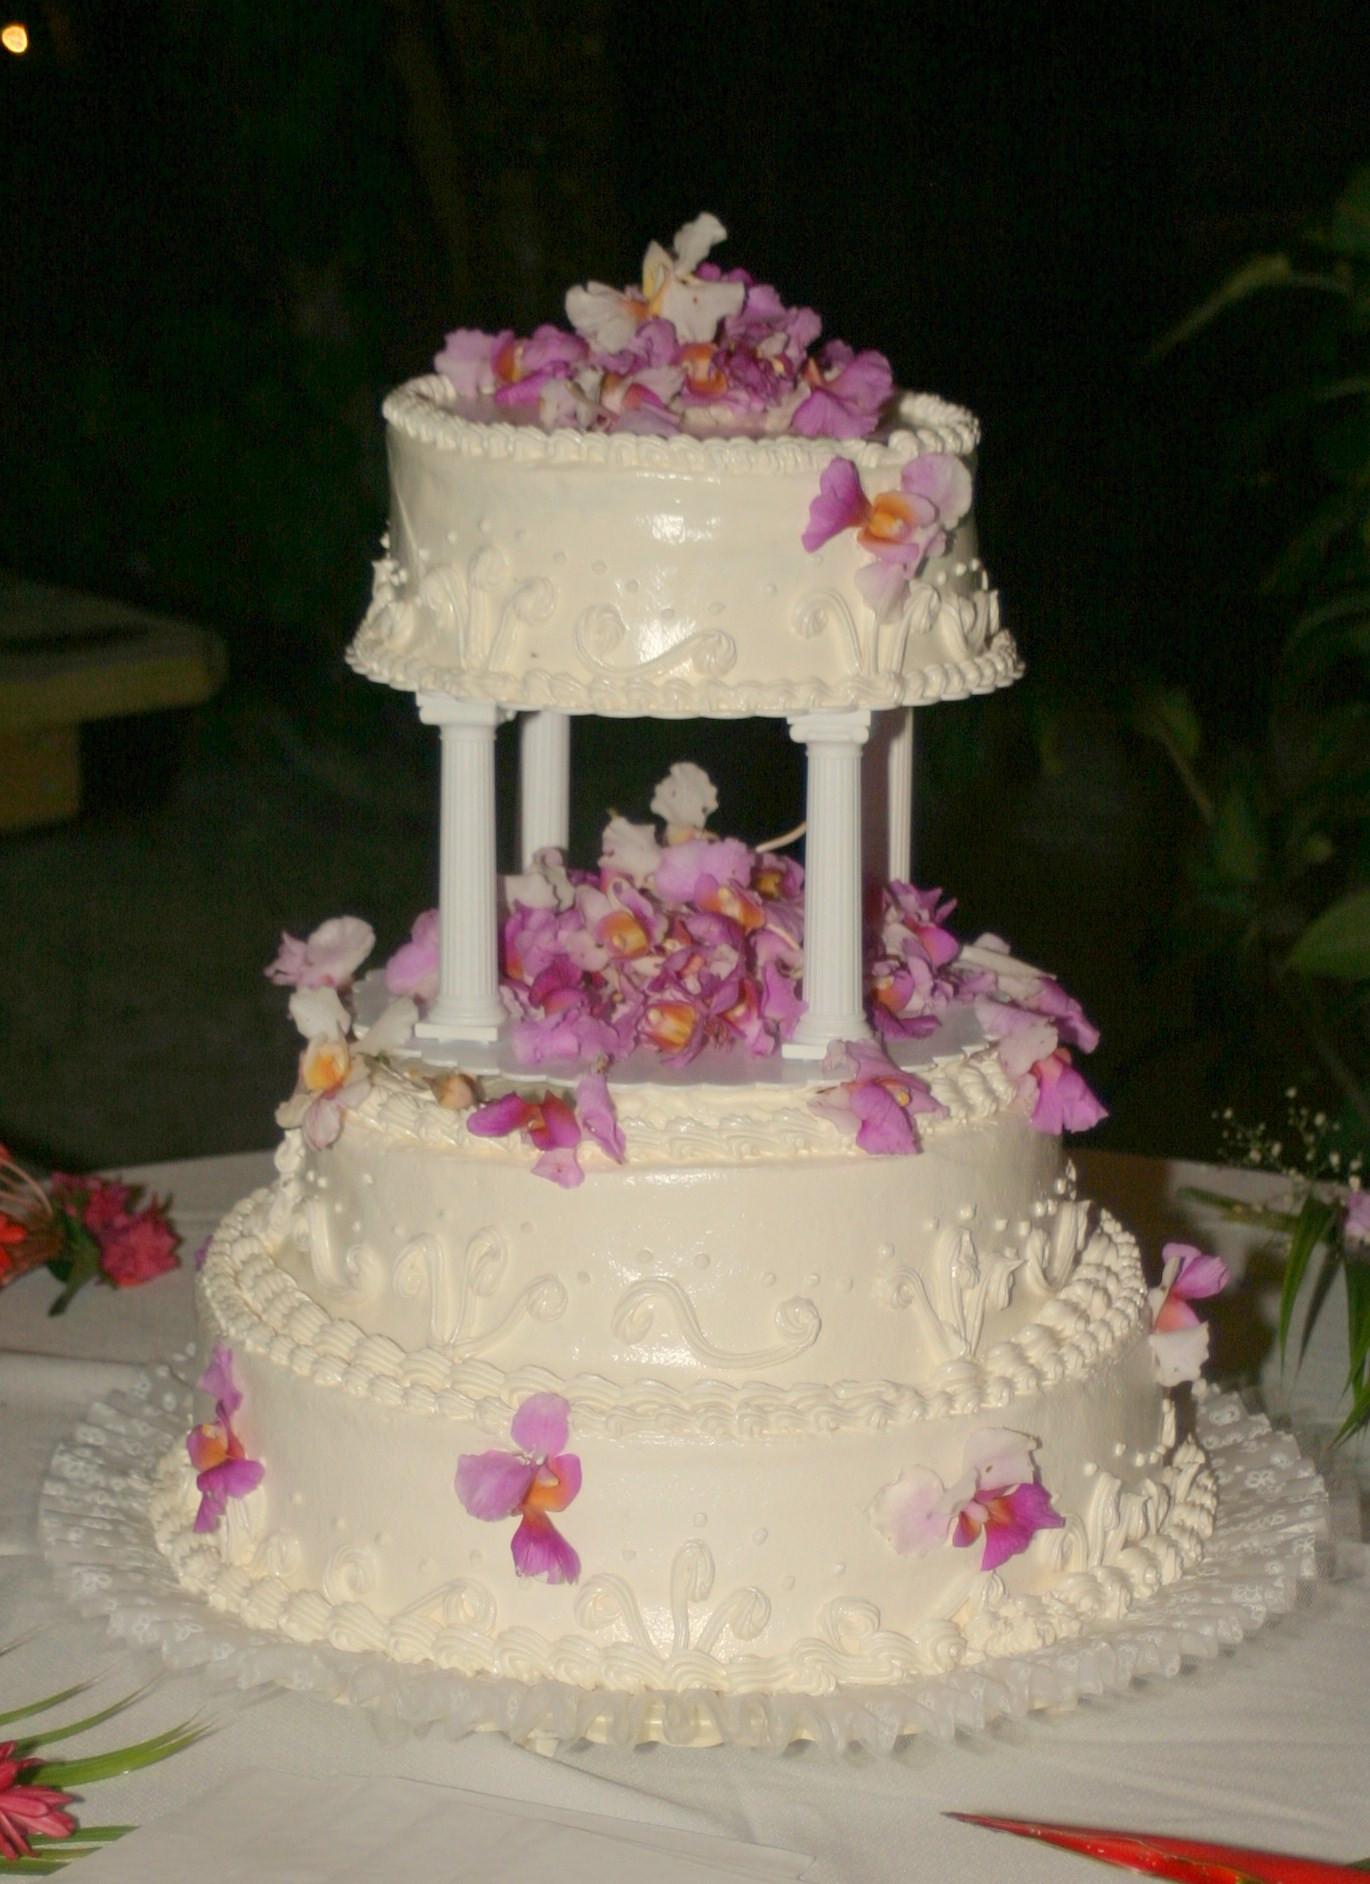 Carribean Wedding Cakes  Caribbean Wedding Girls Utila The Bay Islands Honduras